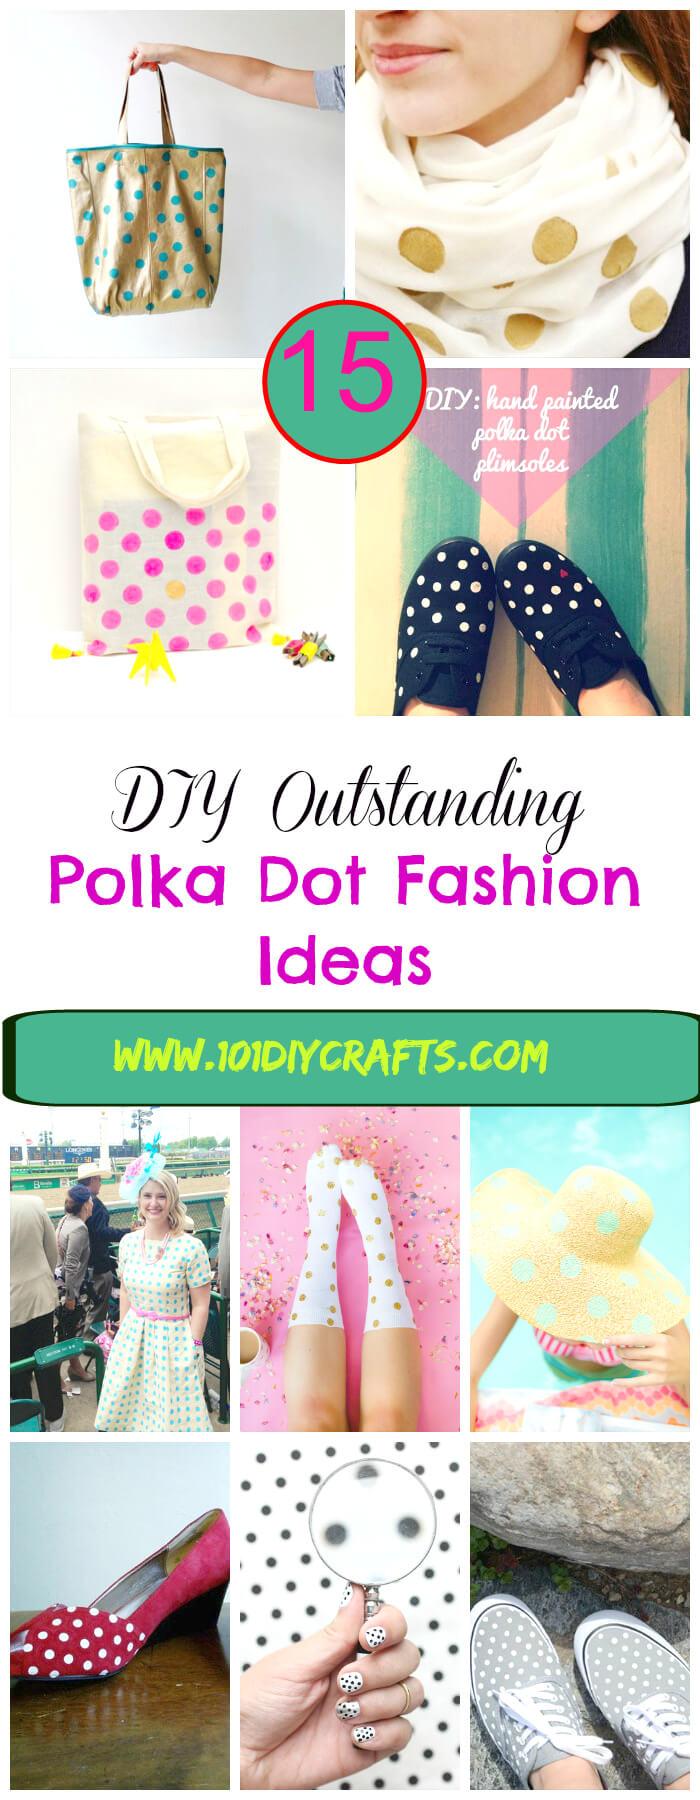 15 DIY Outstanding Polka Dot Fashion Ideas